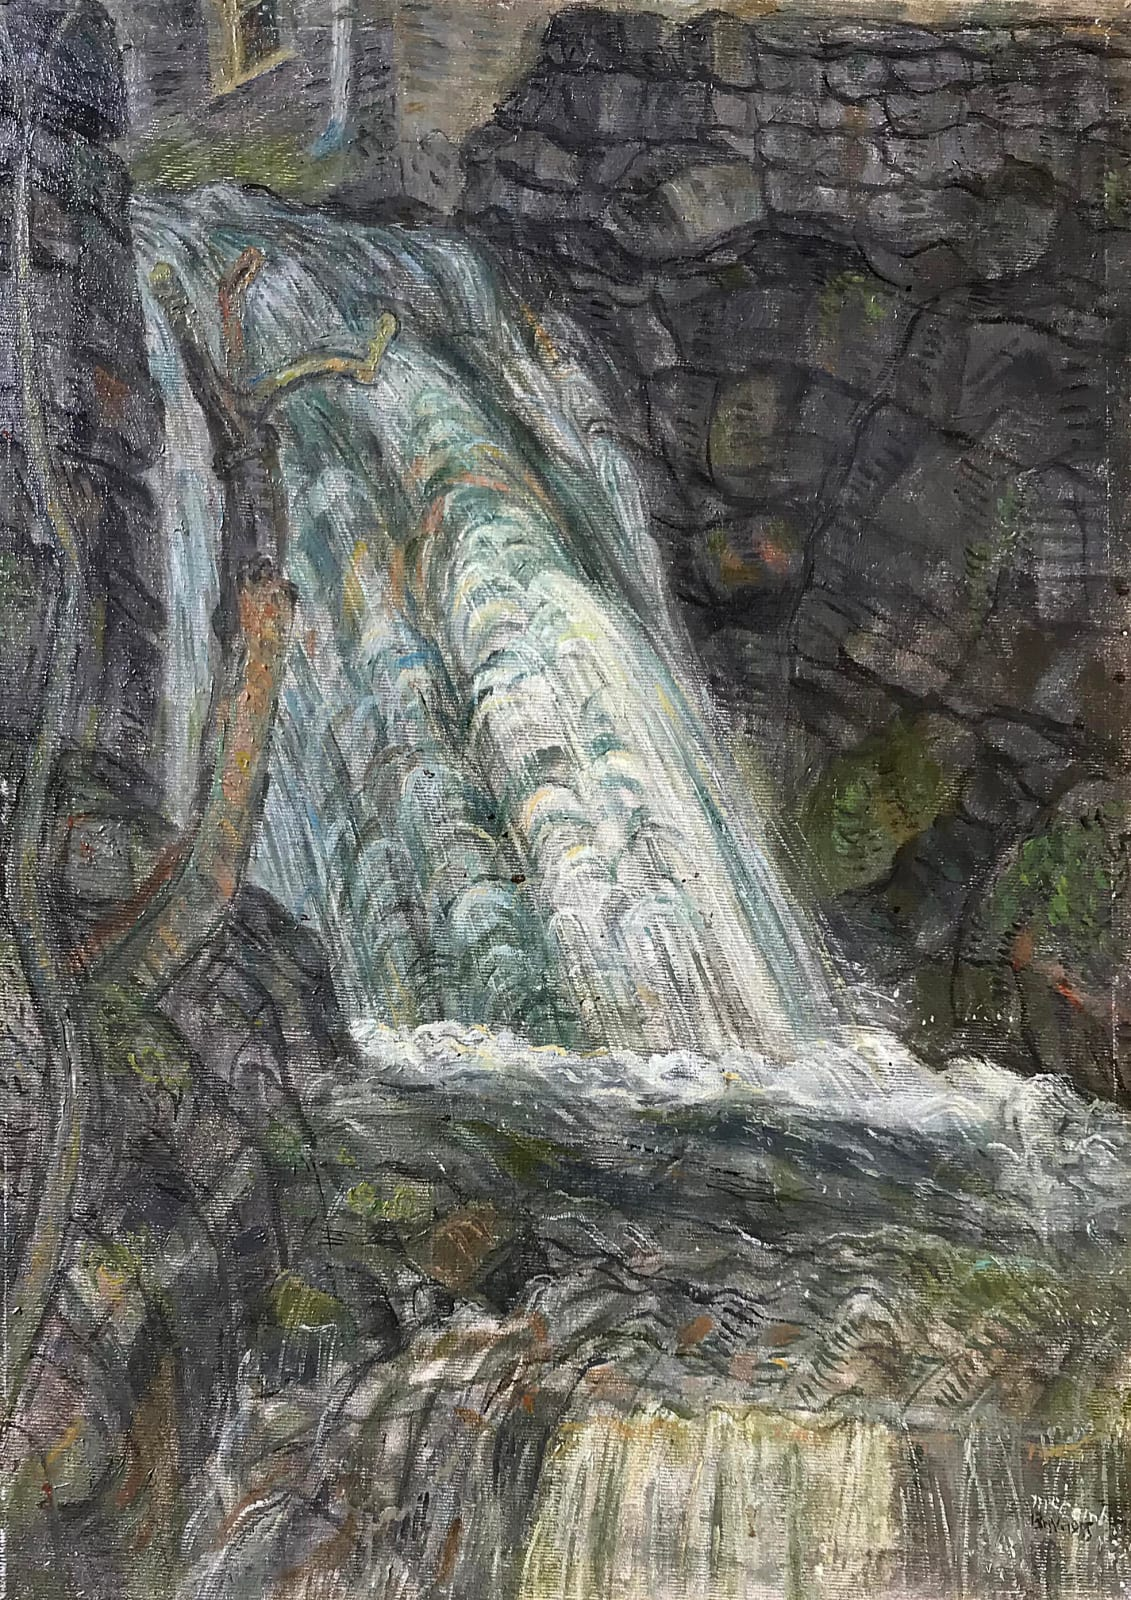 Leonard Mccomb, Waterfall, Anglesey, Wales, 1985